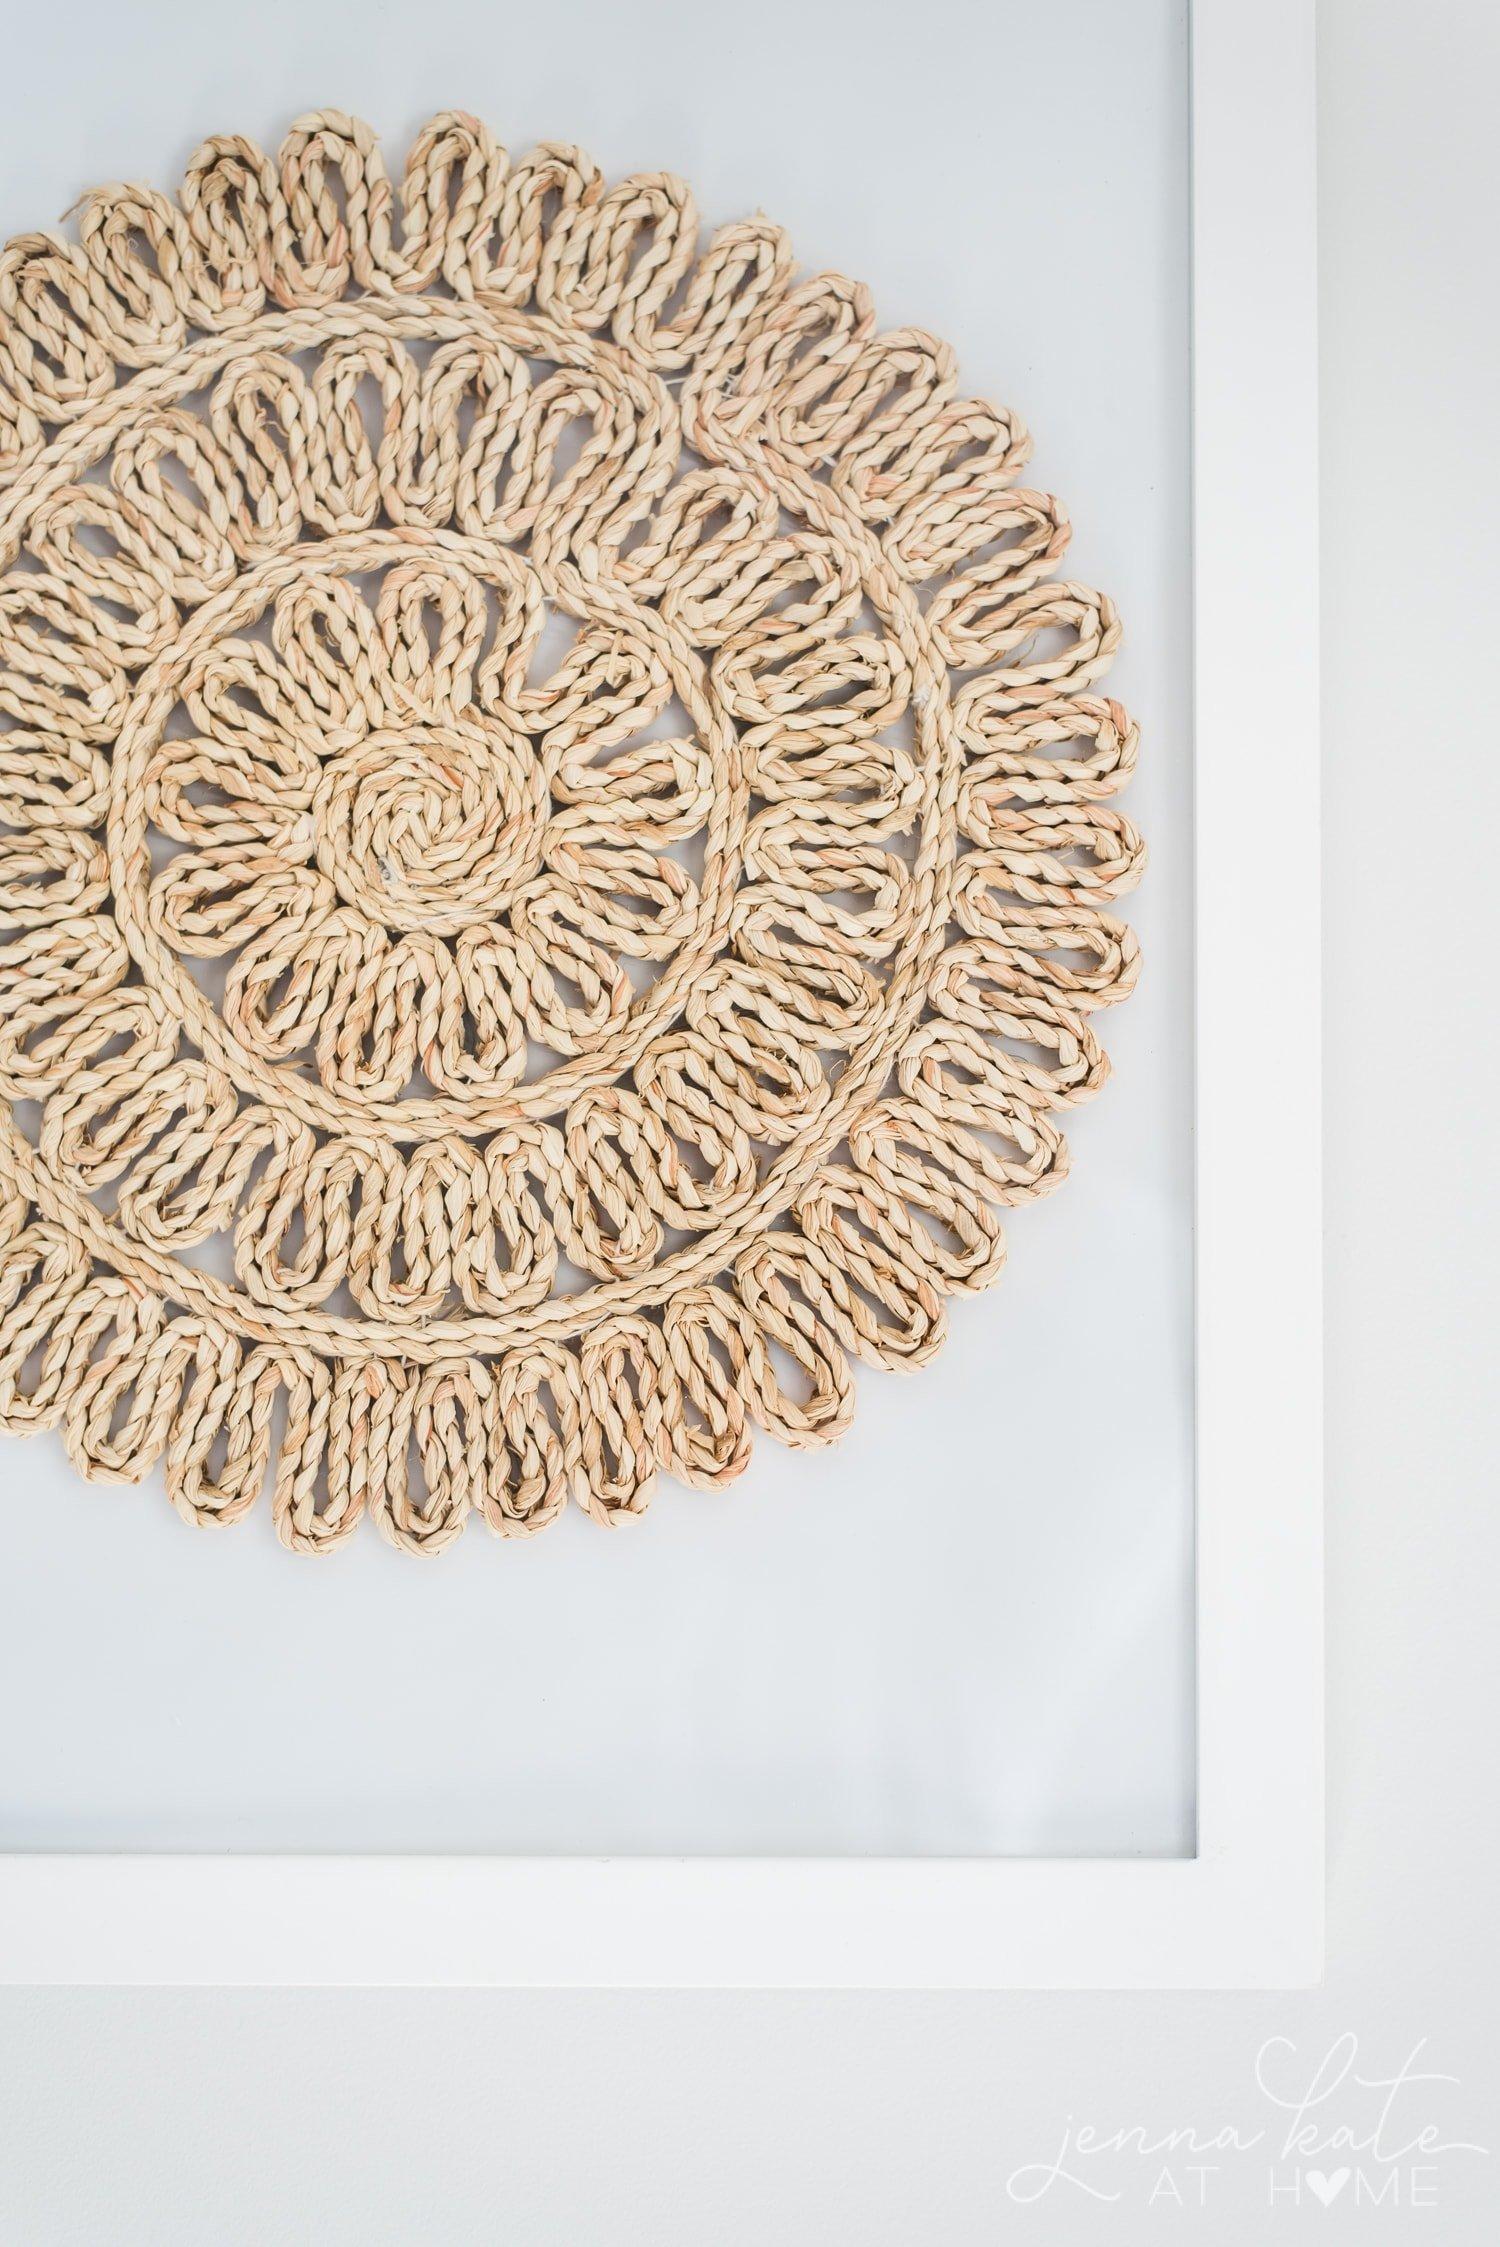 Up close texture of framed rattan place mat